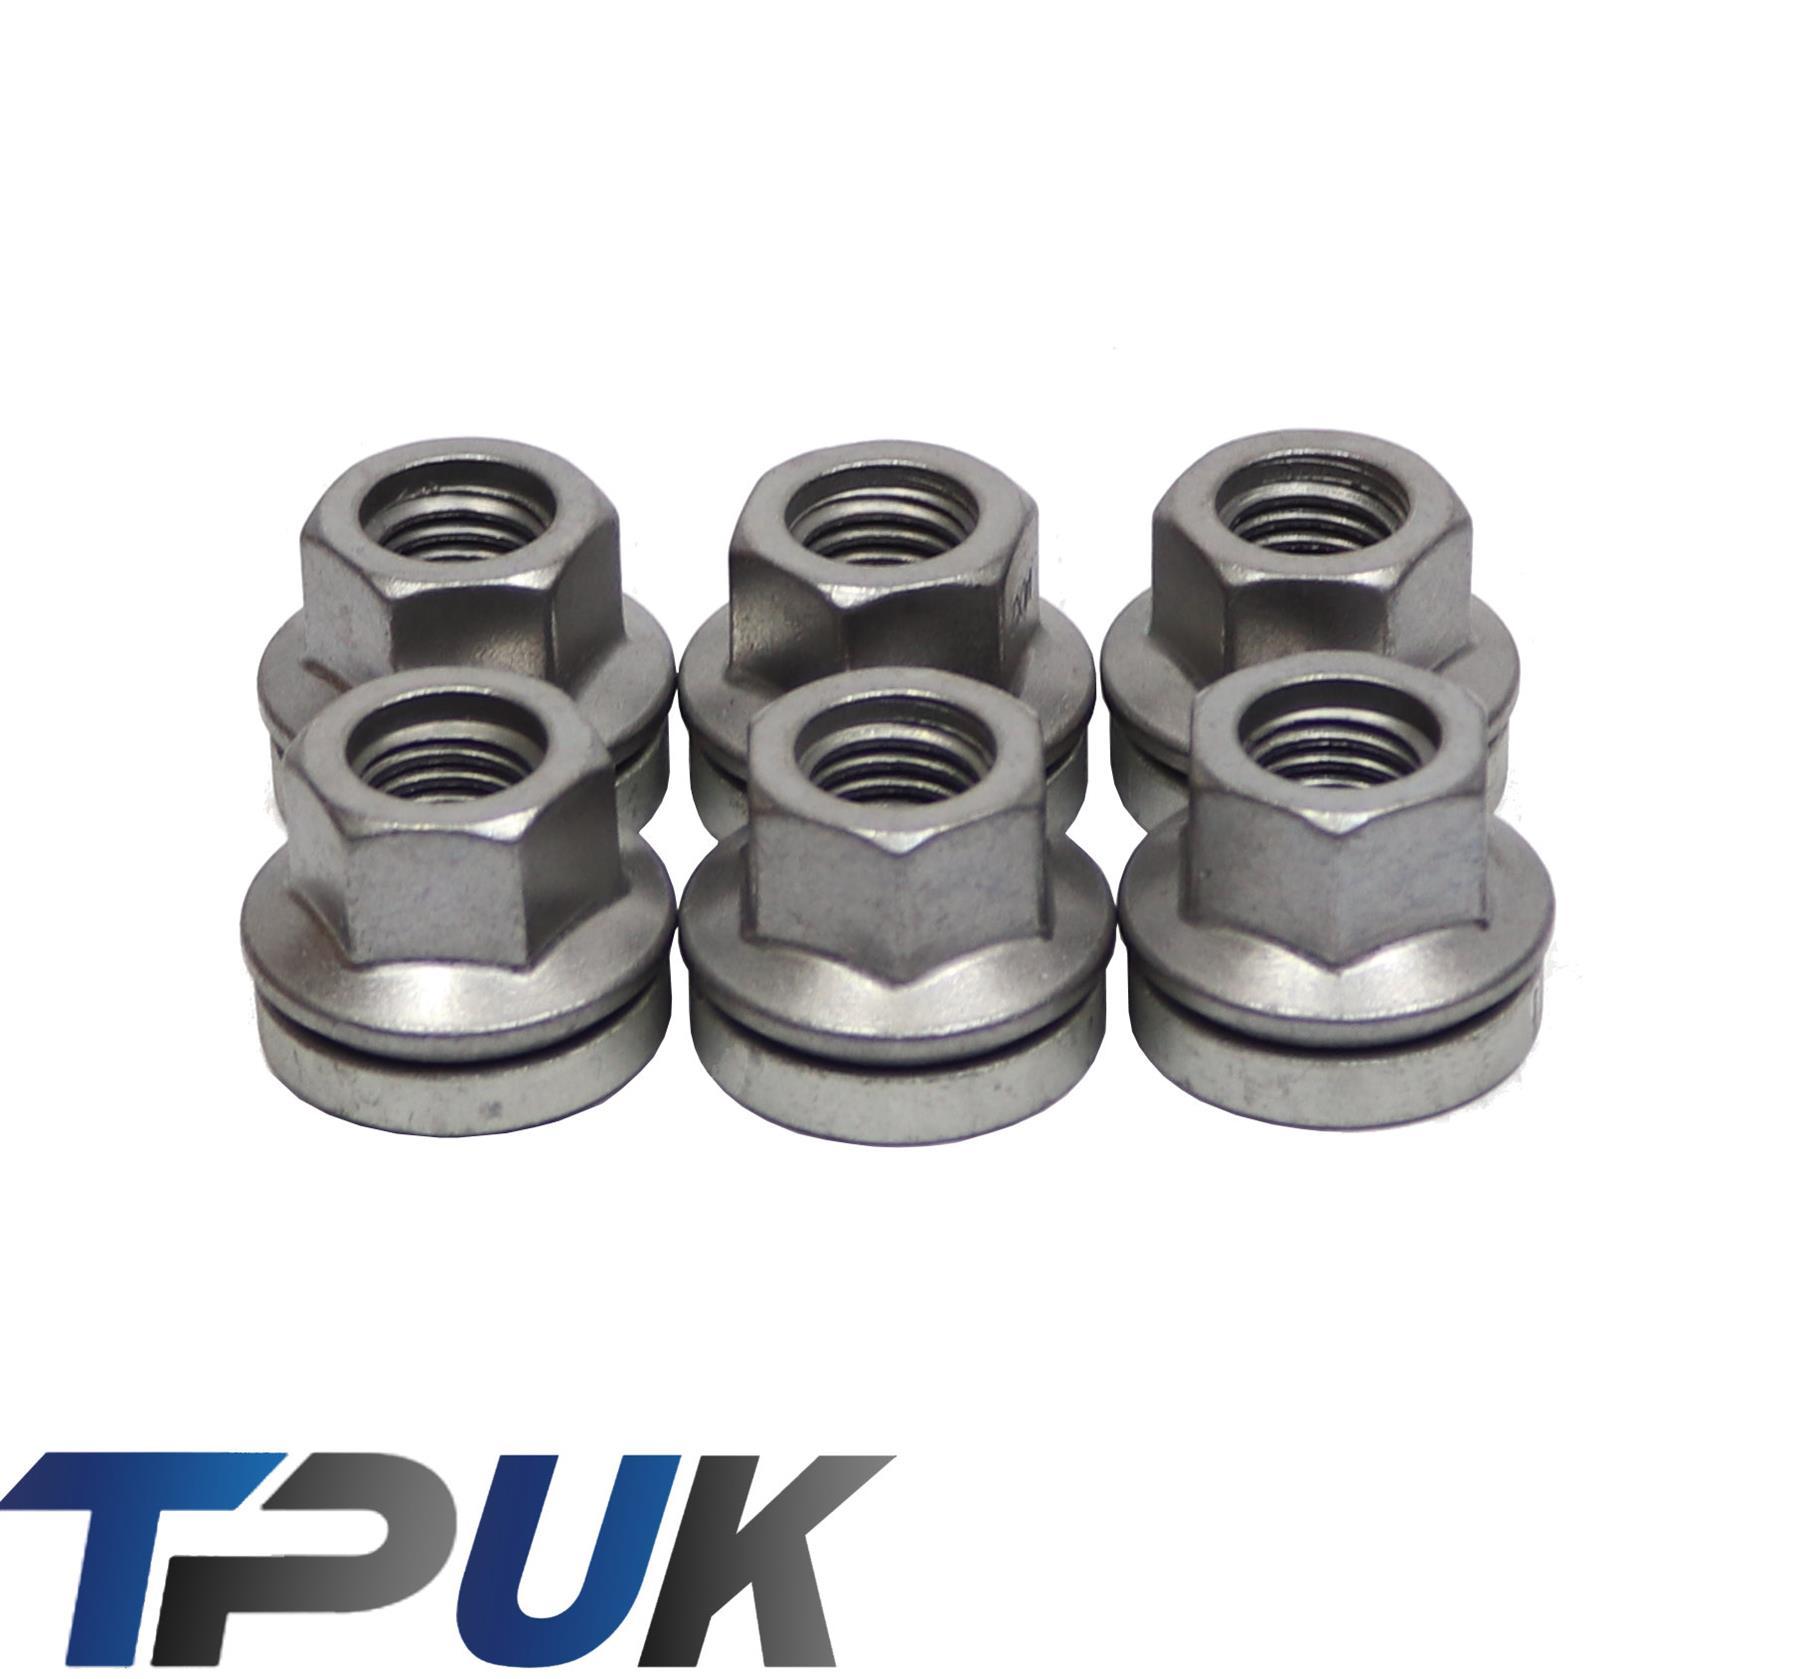 alloy wheel nuts bolts M14x2 21mm Hex Flat Seat Chrome caps Ford Transit x 20